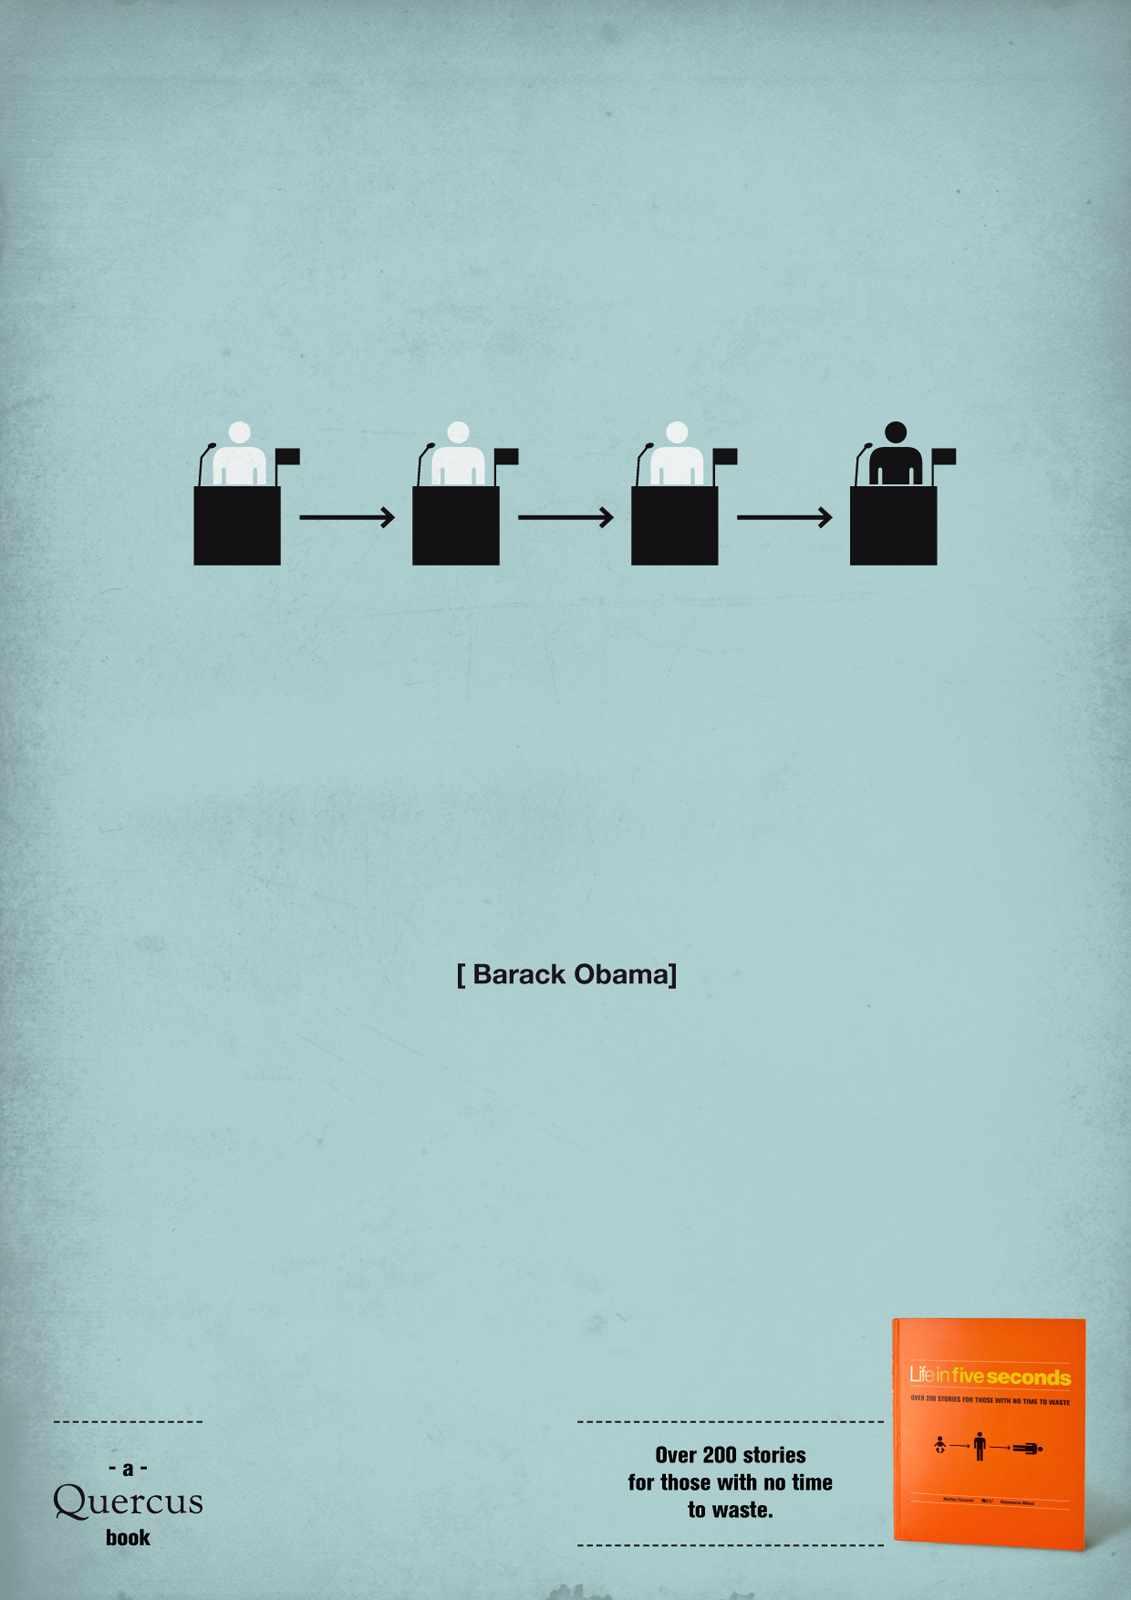 quercus books, life in five seconds Barack Obama